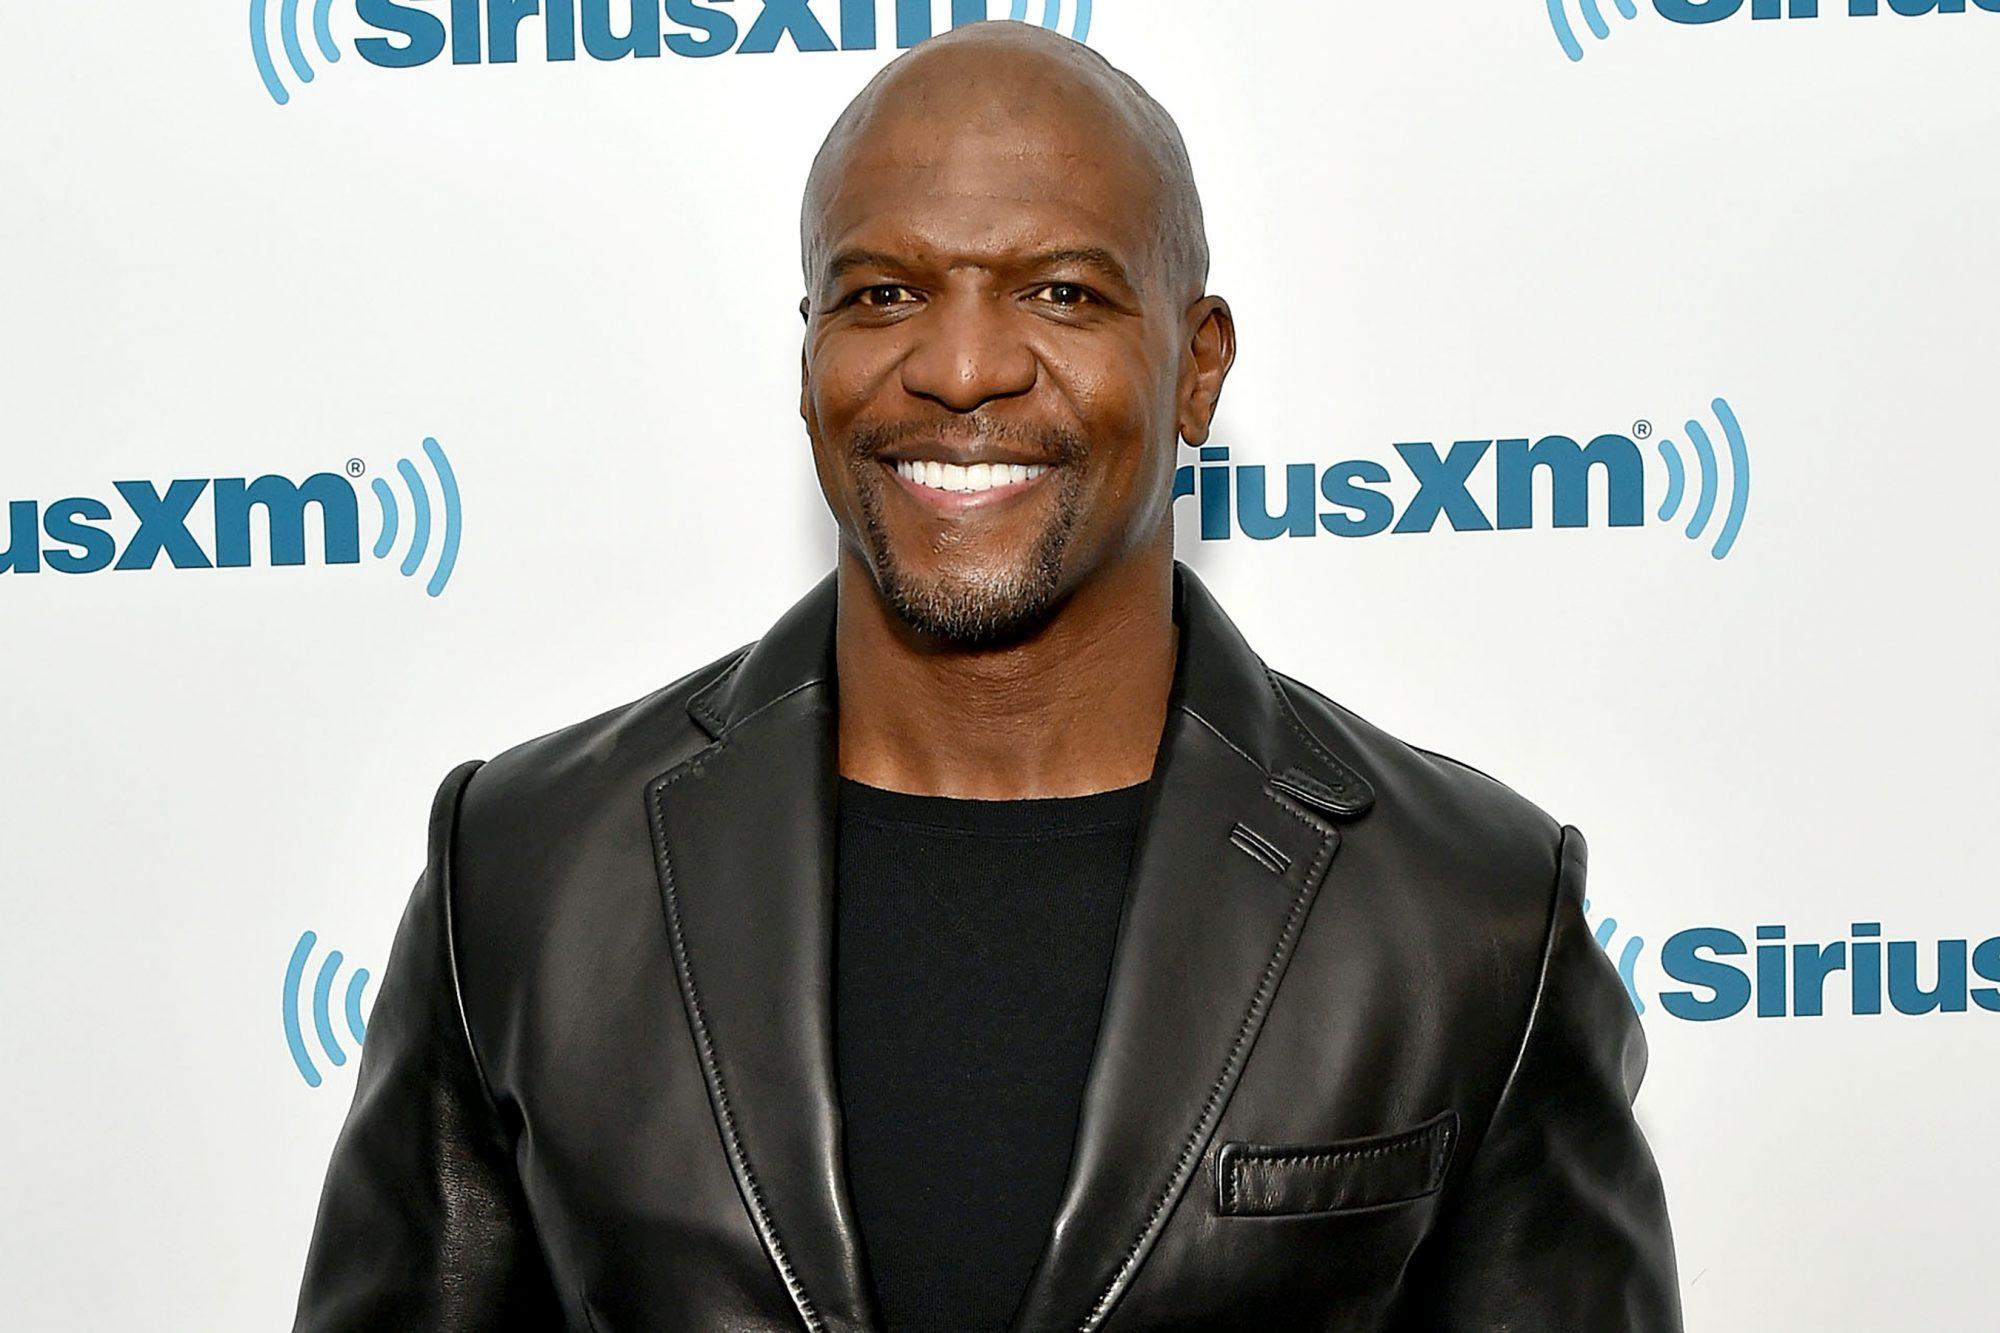 Celebrities Visit SiriusXM - September 29, 2017